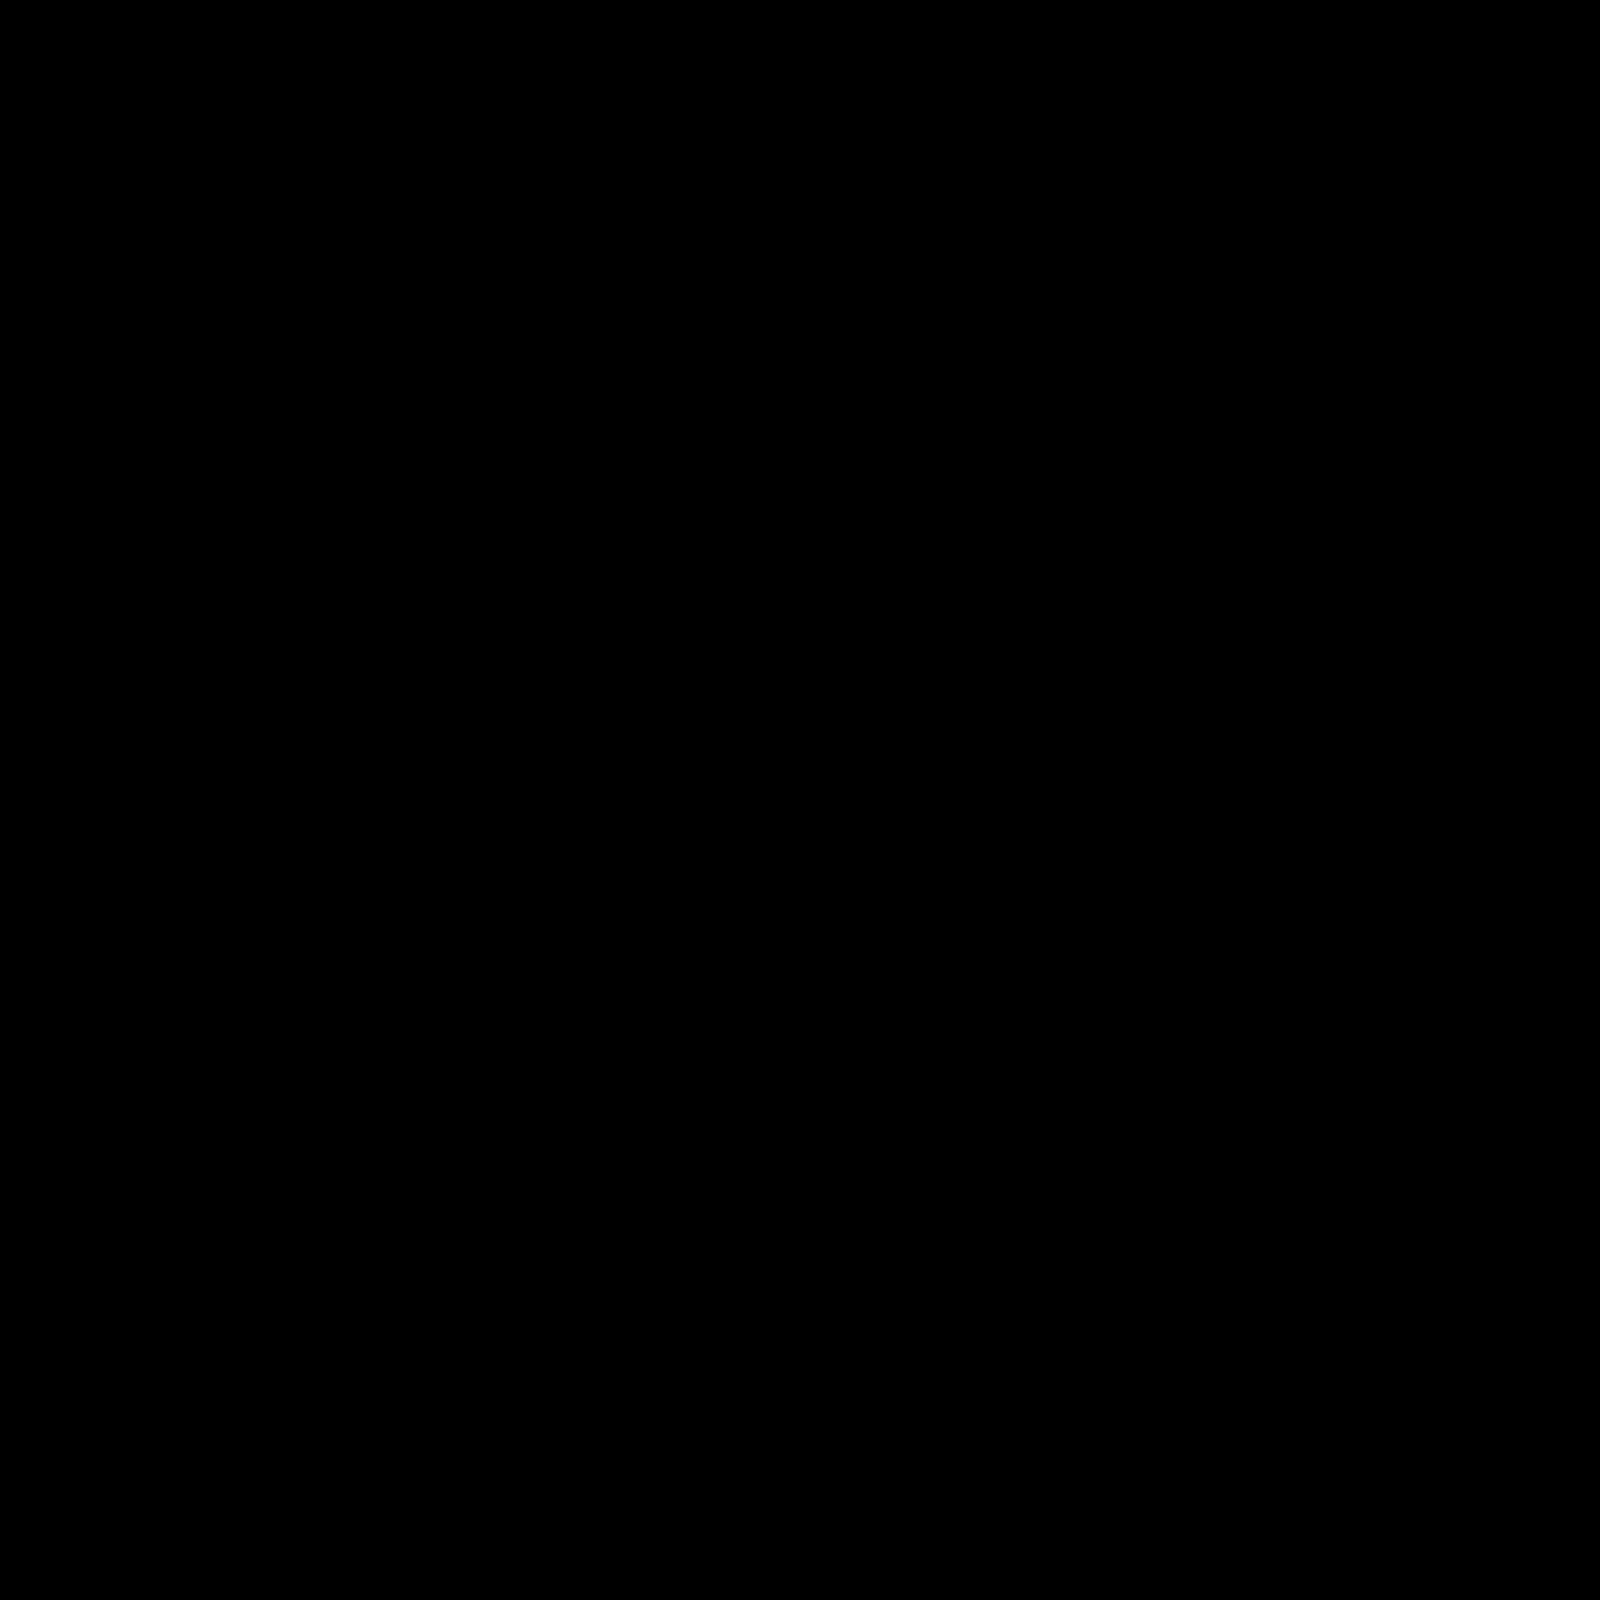 Criar ícone icon